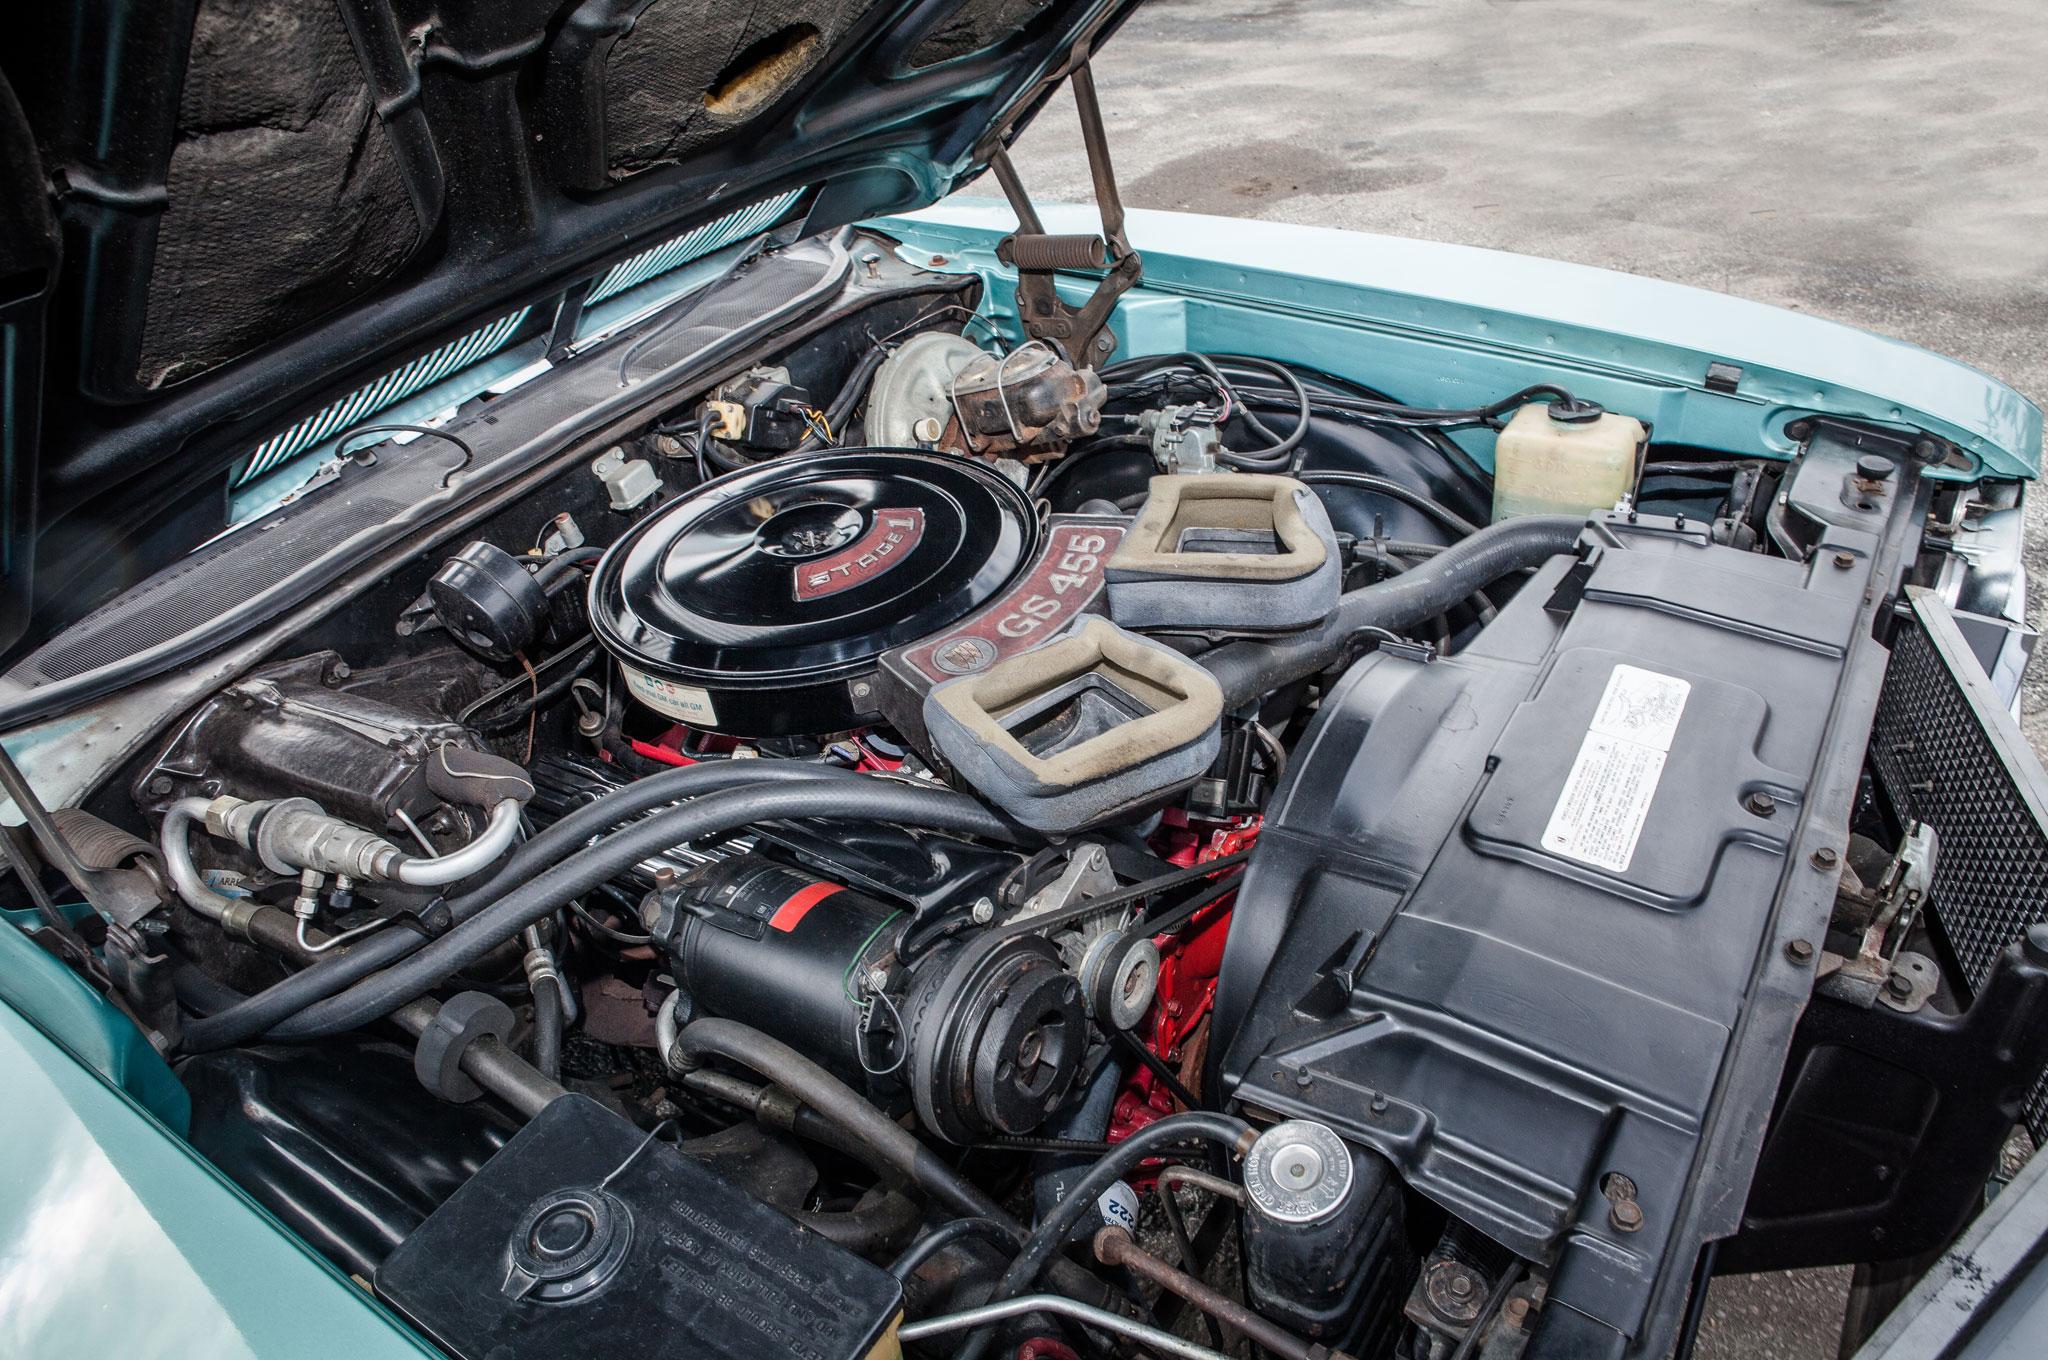 Buick 350 Engine Diagram 2000 Bmw Radio Wiring Diagram Begeboy Wiring Diagram Source